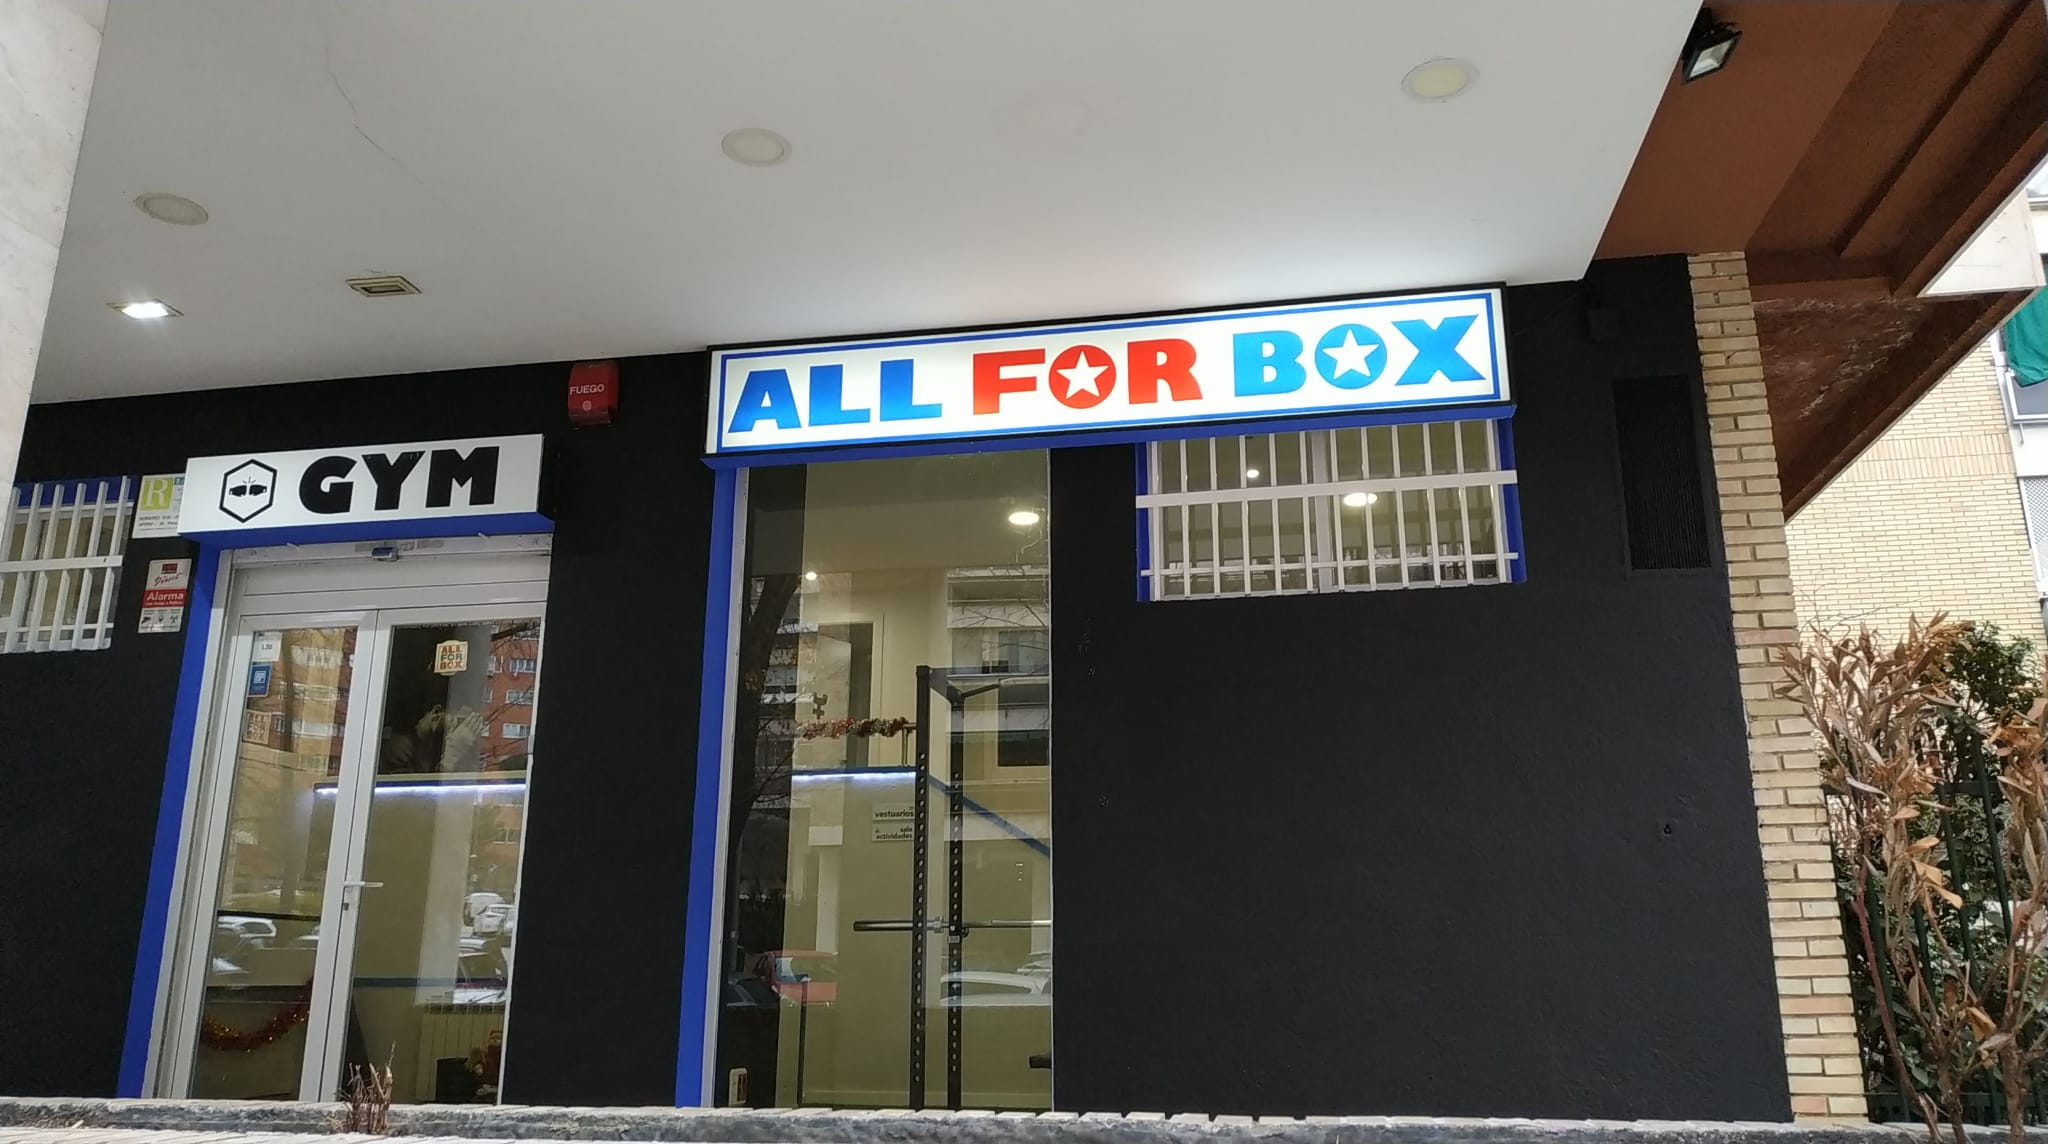 All for box Gym - Gimnasio en Chamartin